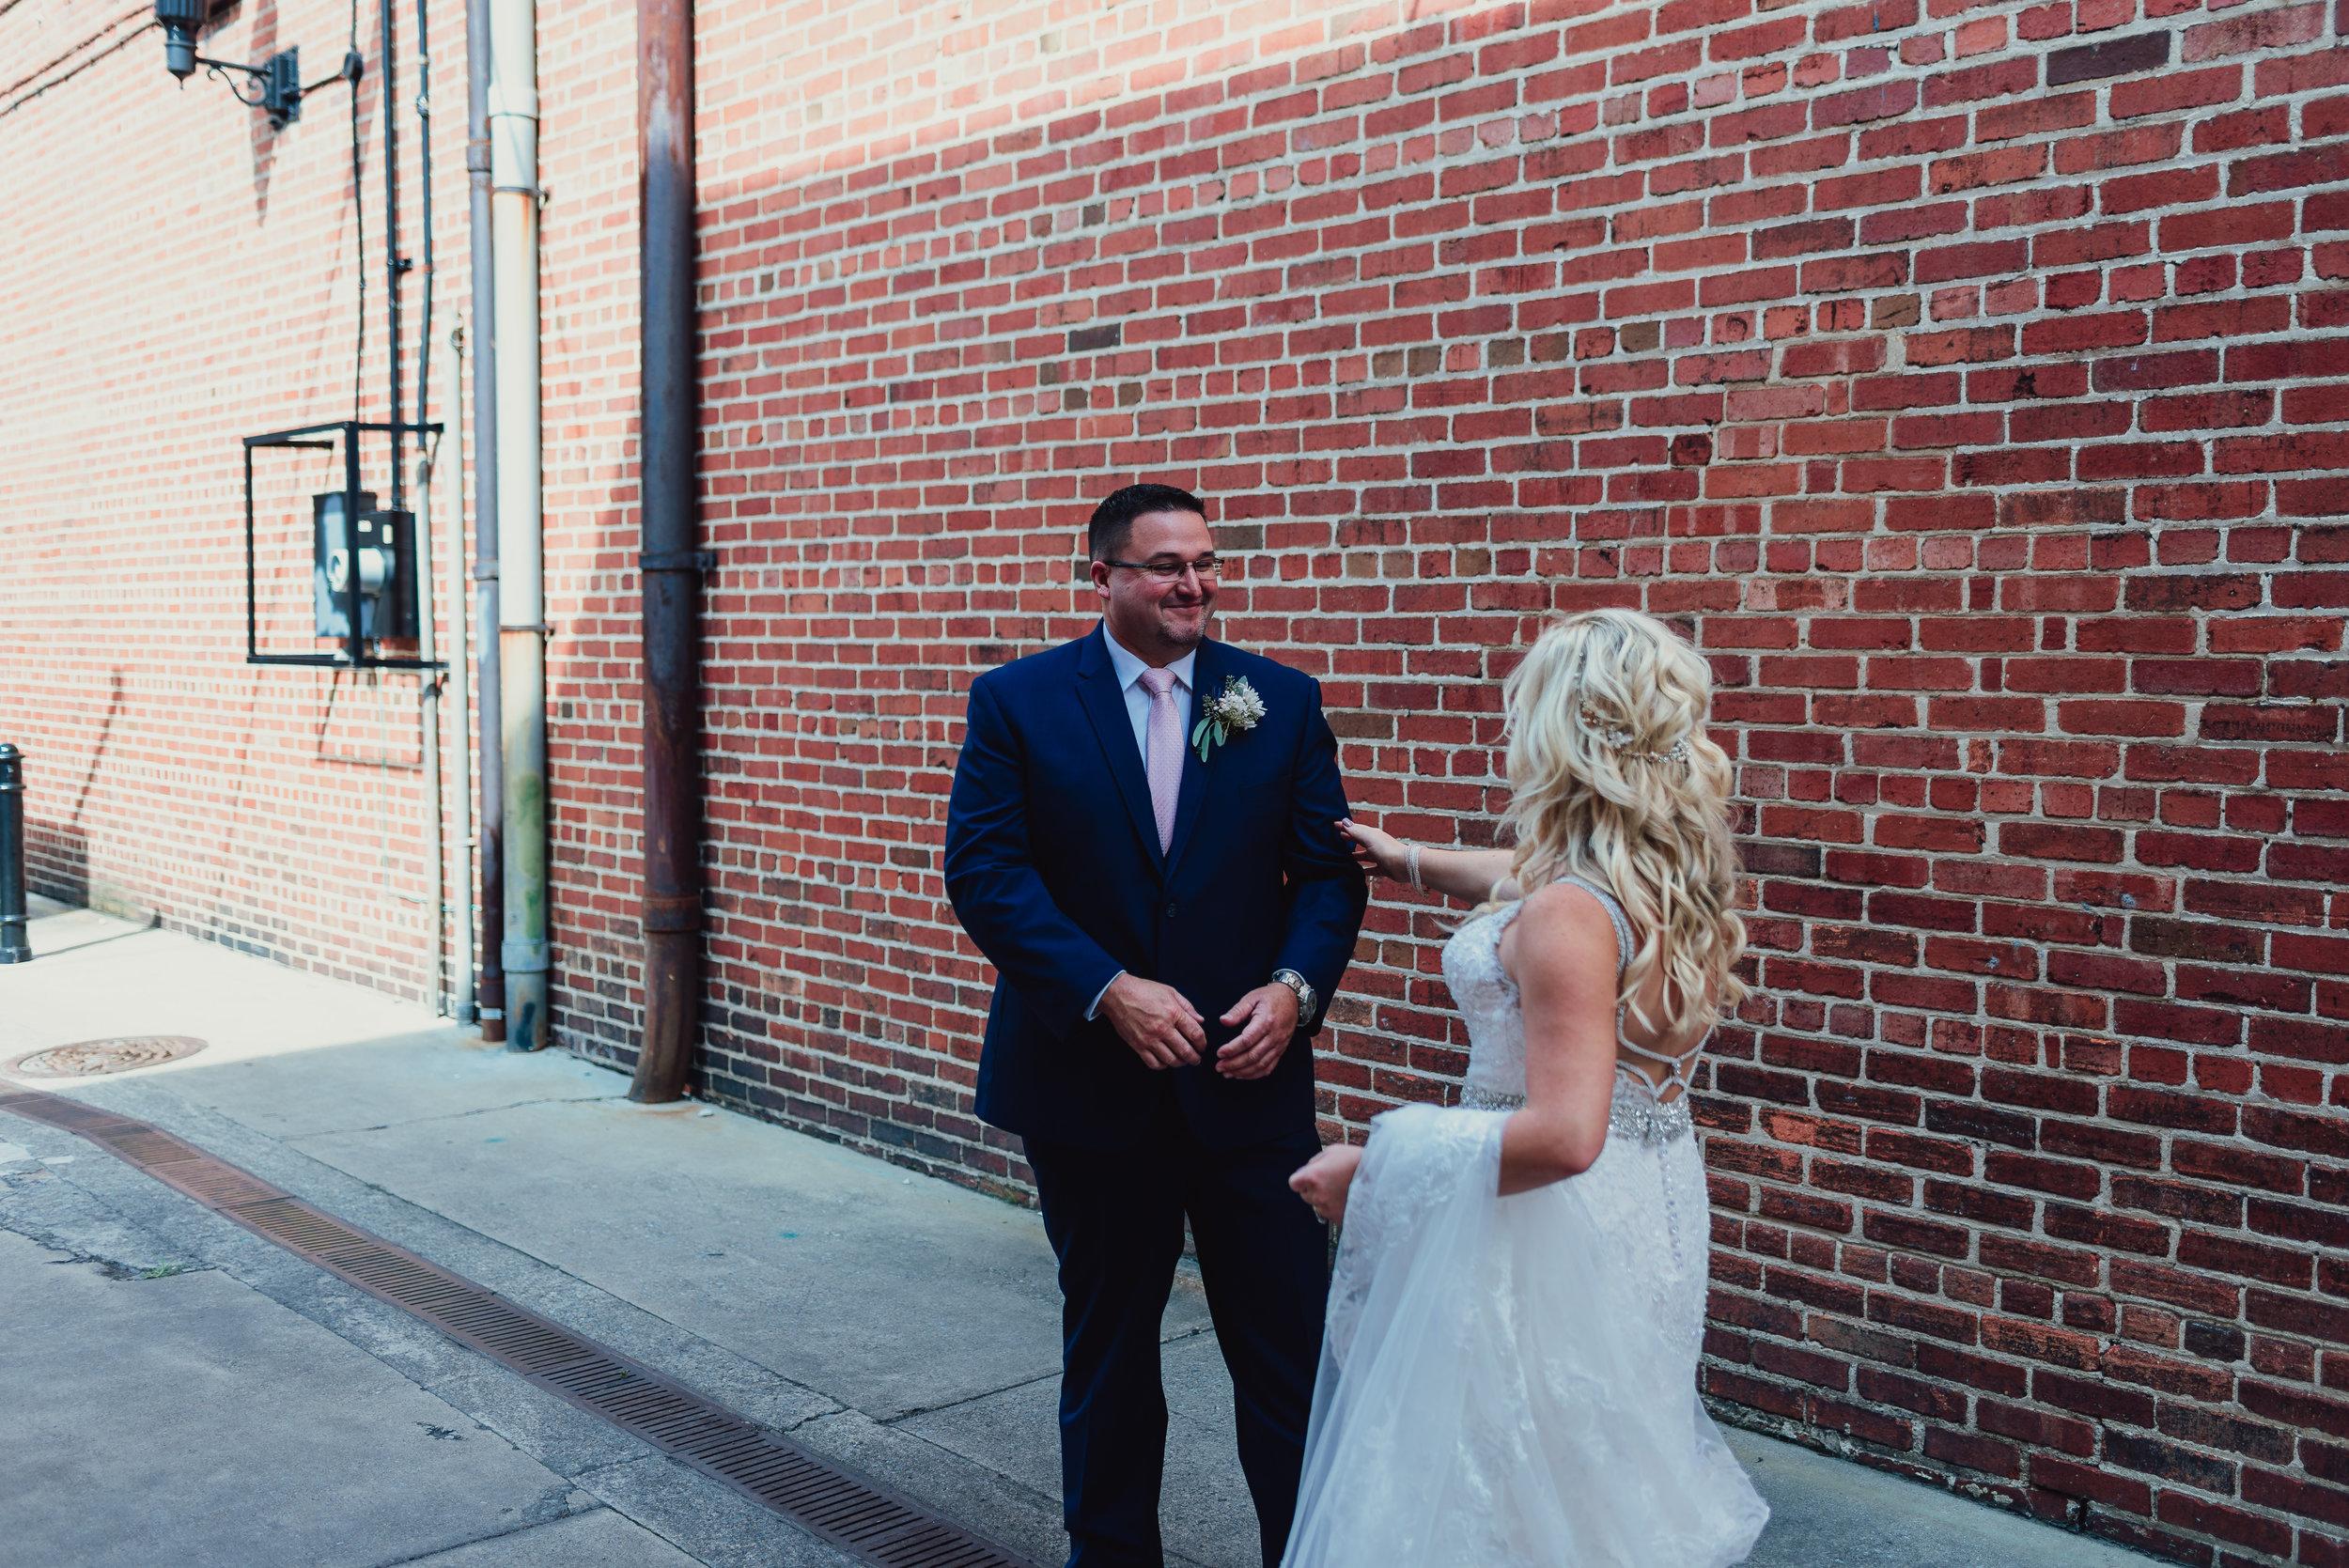 east-tn-wedding-photographer-tennessee-elopement-photographer-kingsport-tn-wedding-photographer (229 of 1001).jpg